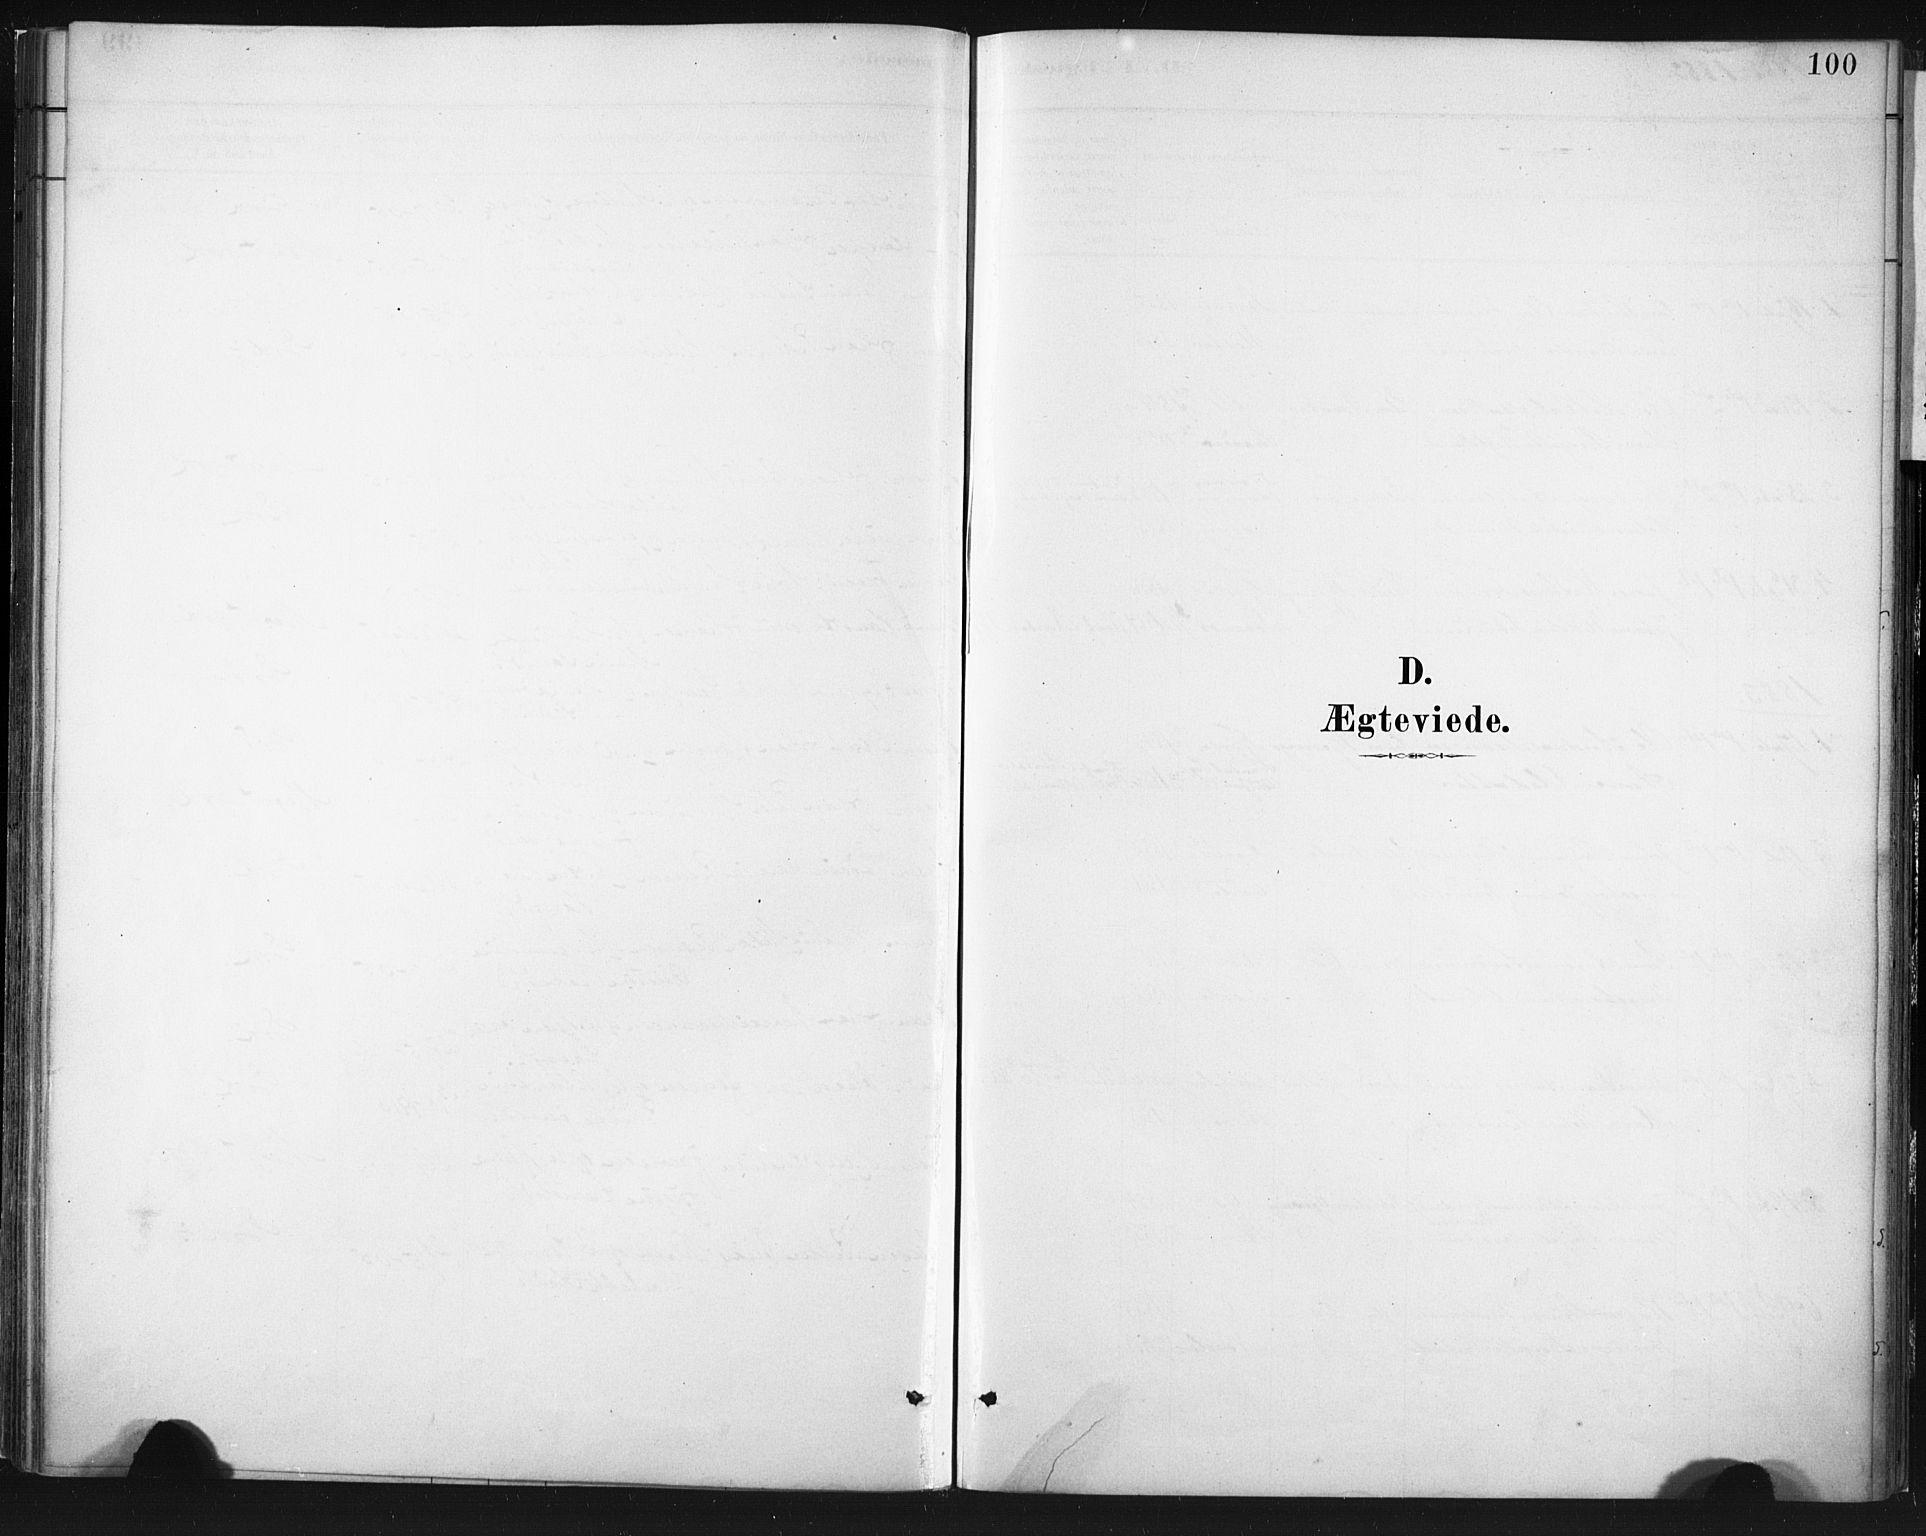 SAT, Ministerialprotokoller, klokkerbøker og fødselsregistre - Nordland, 803/L0071: Ministerialbok nr. 803A01, 1881-1897, s. 100